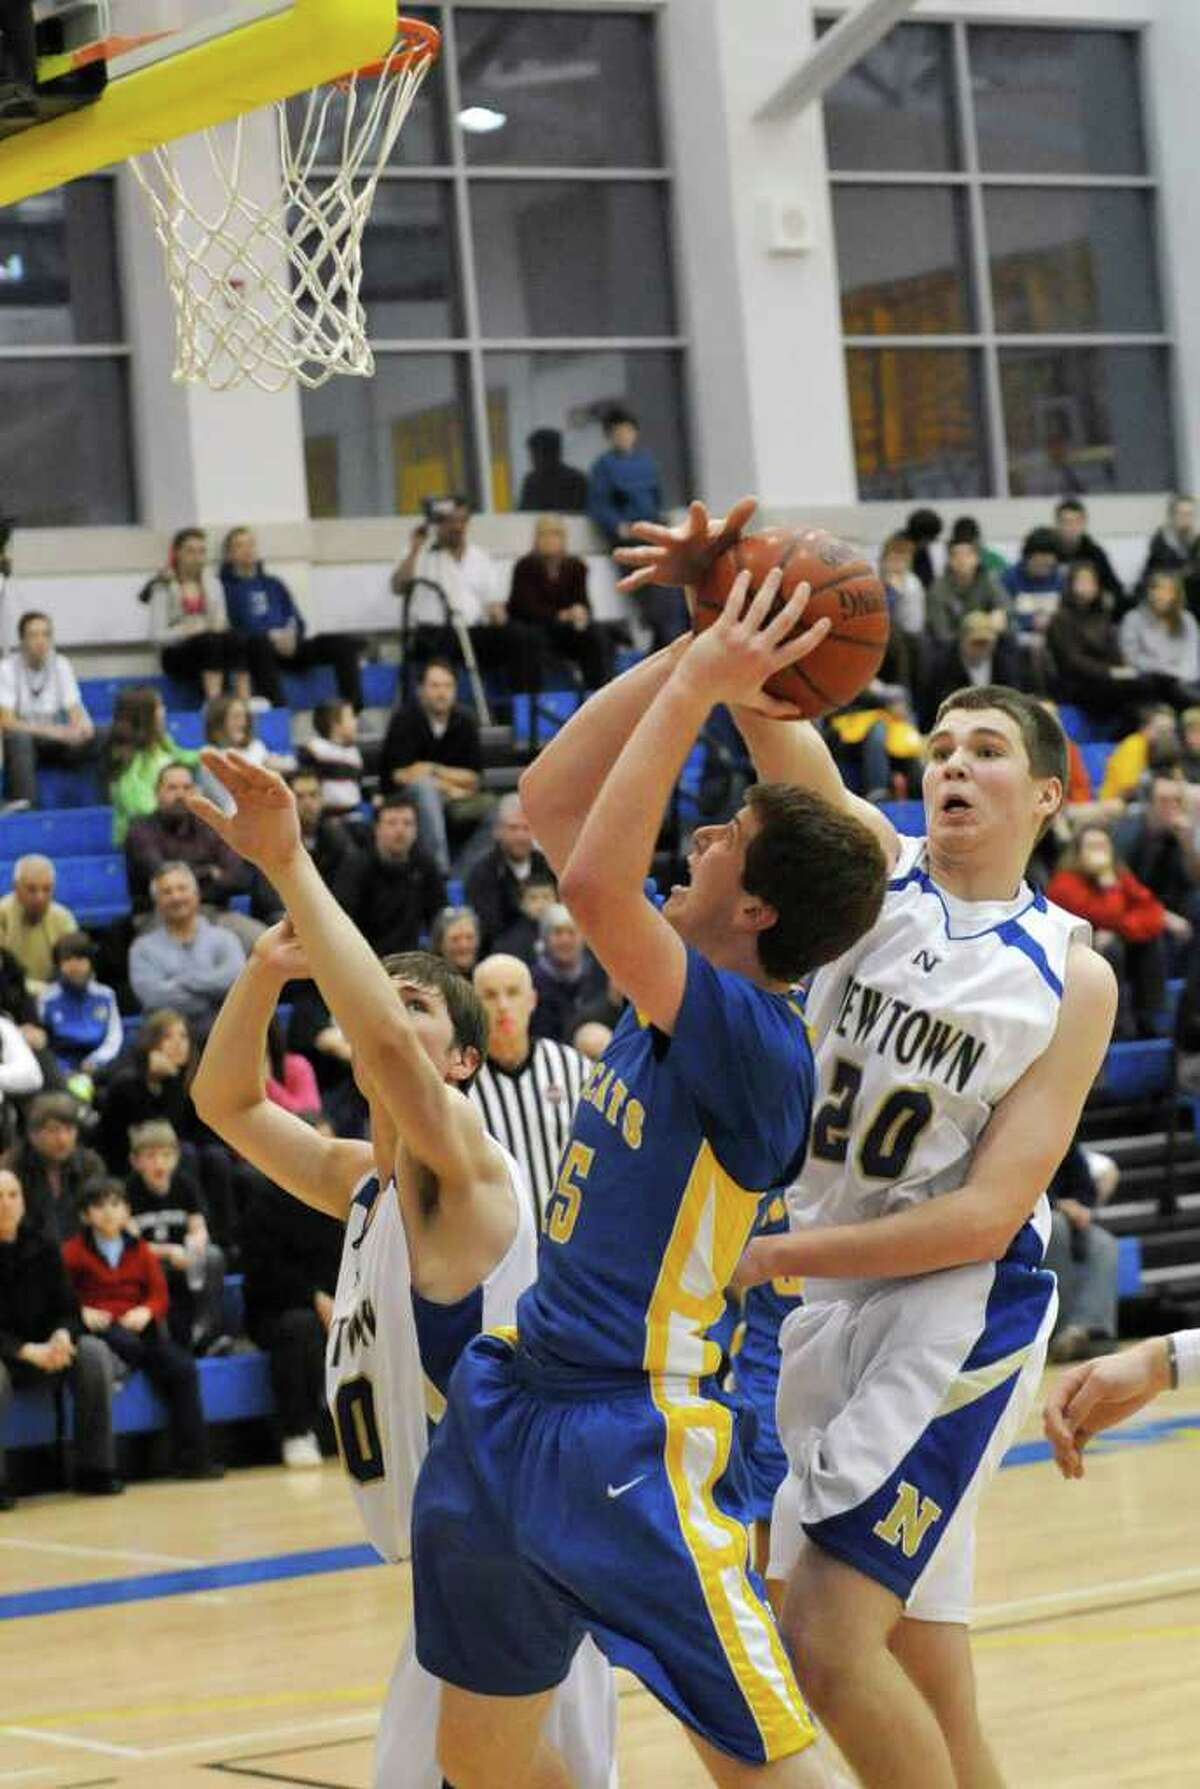 Newtown's Mike Davis blocks the shot of Brookfield's Danny Burkhart during their game at Newtown High School on Friday, Jan. 27, 2012. Newtown won 66-50.